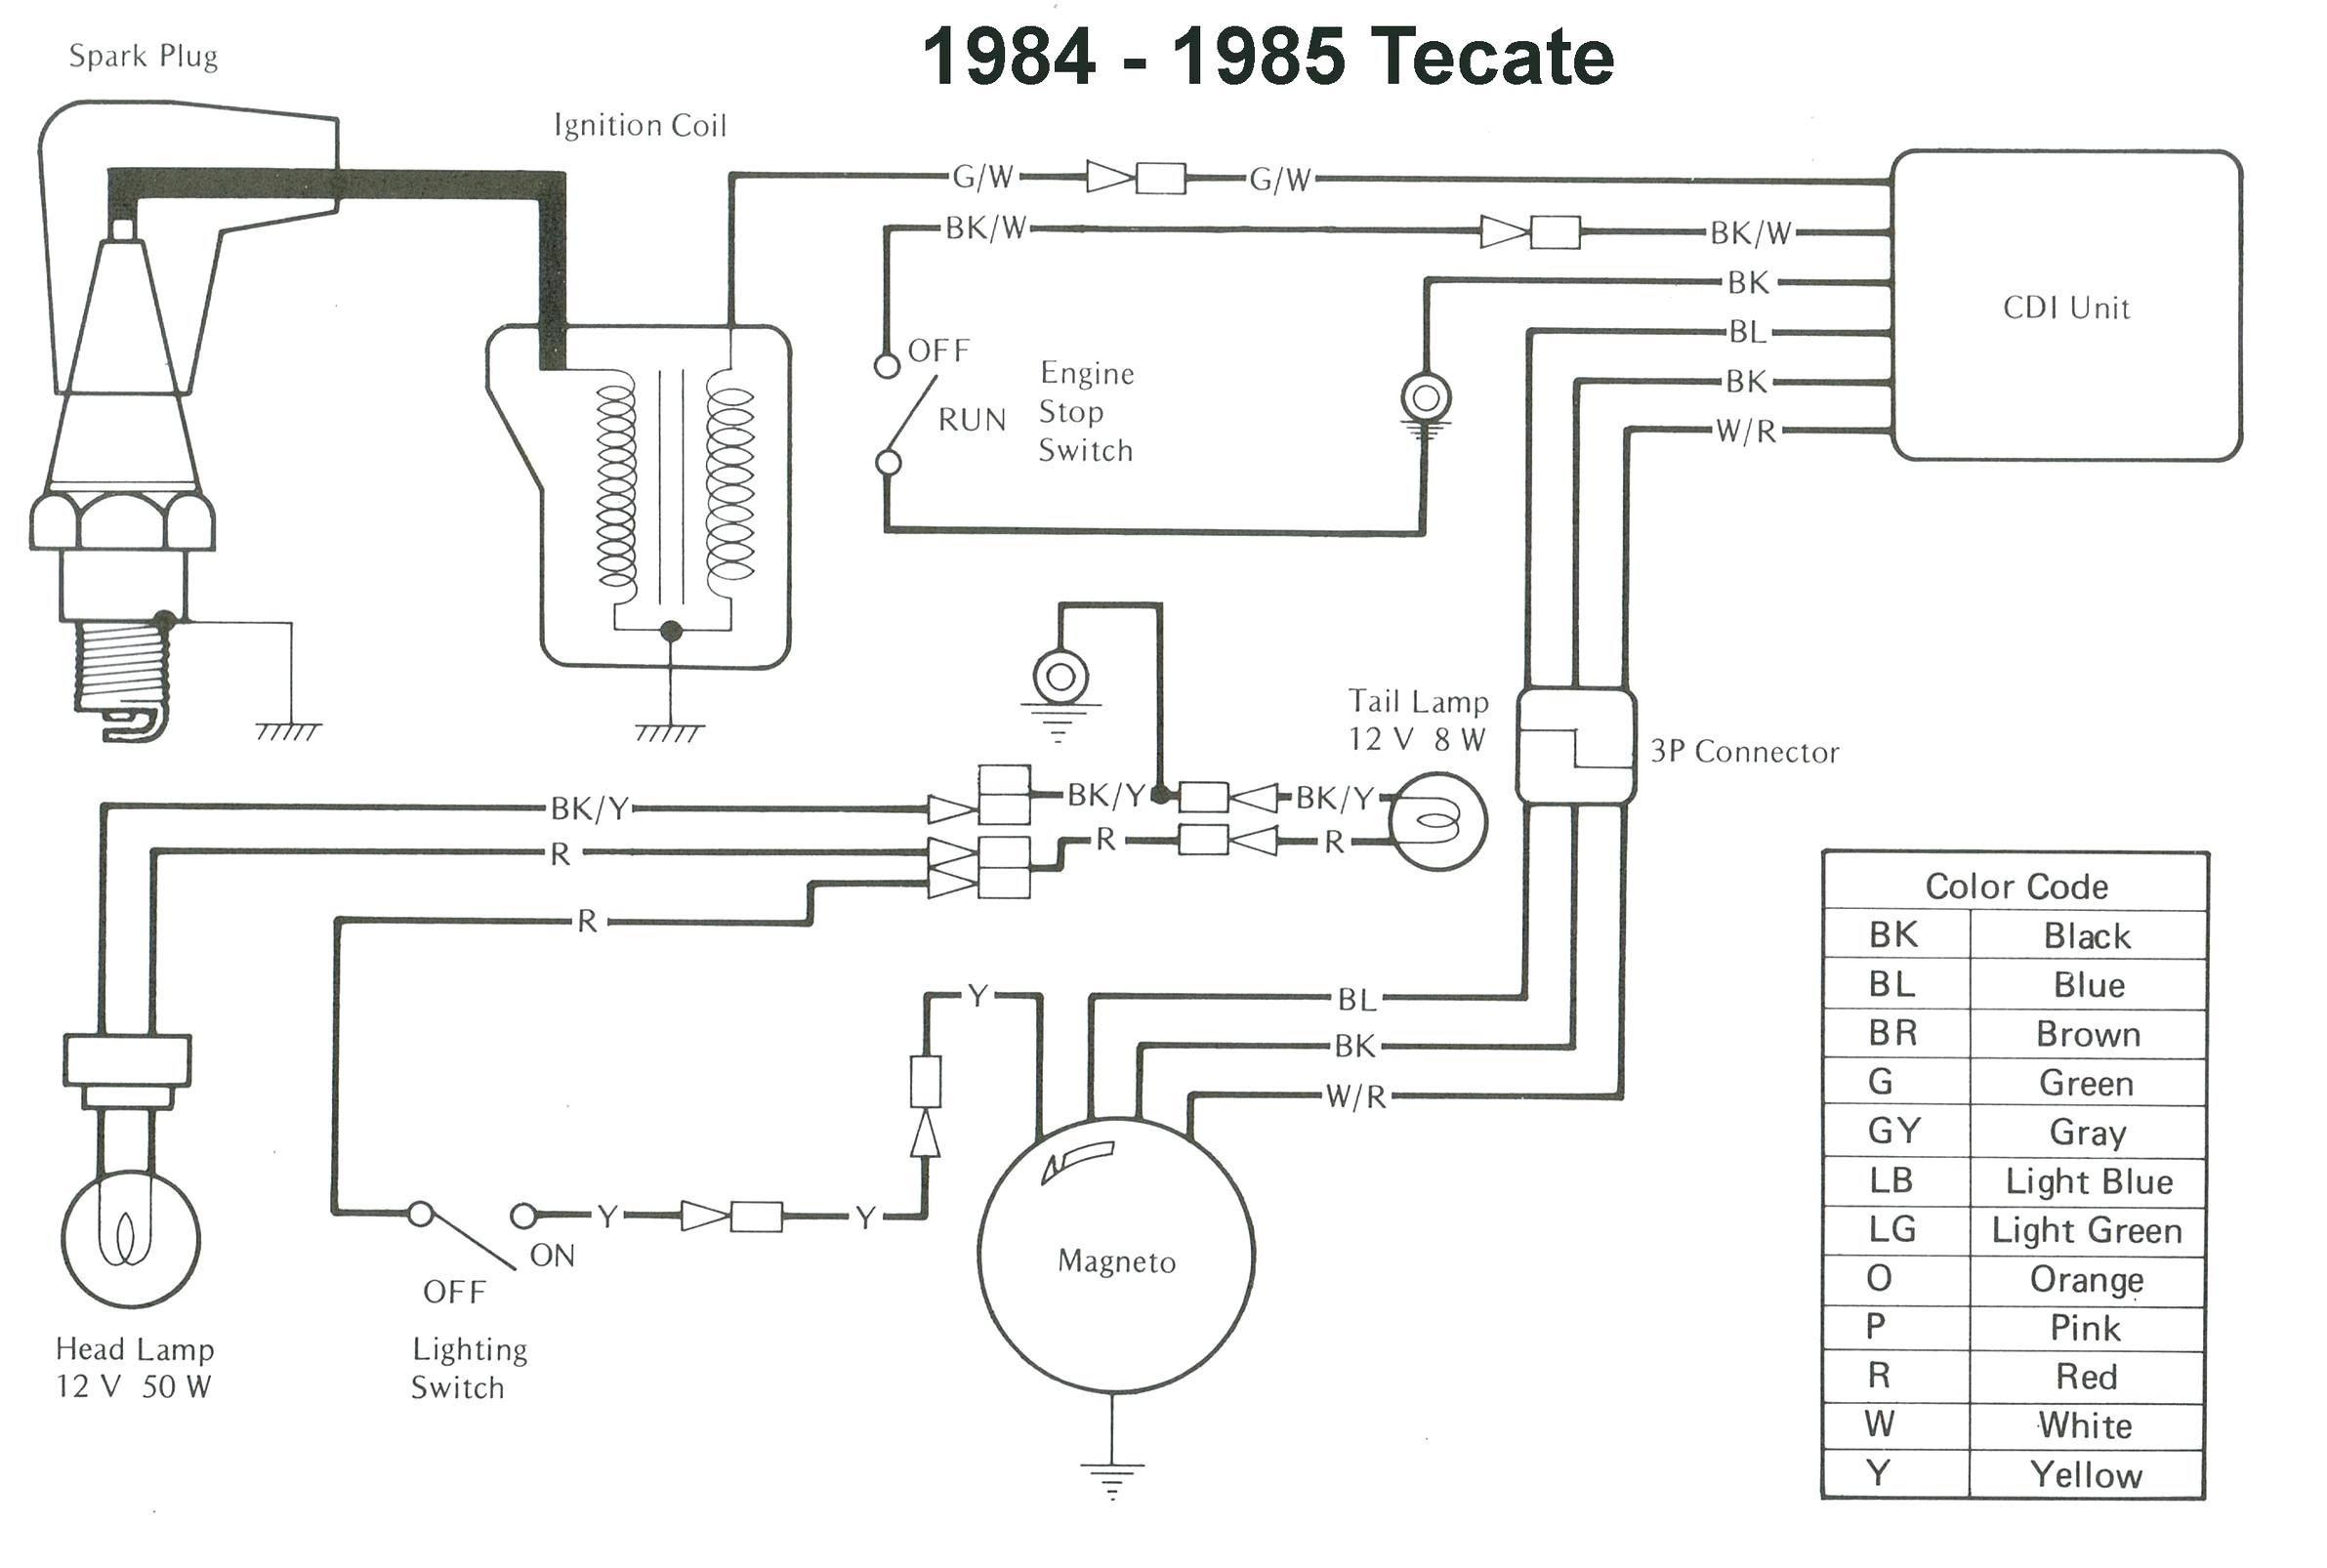 Diagram Kawasaki Bayou Cdi Wiring Diagram Full Version Hd Quality Wiring Diagram Sitexfulk Noidimontegiorgio It